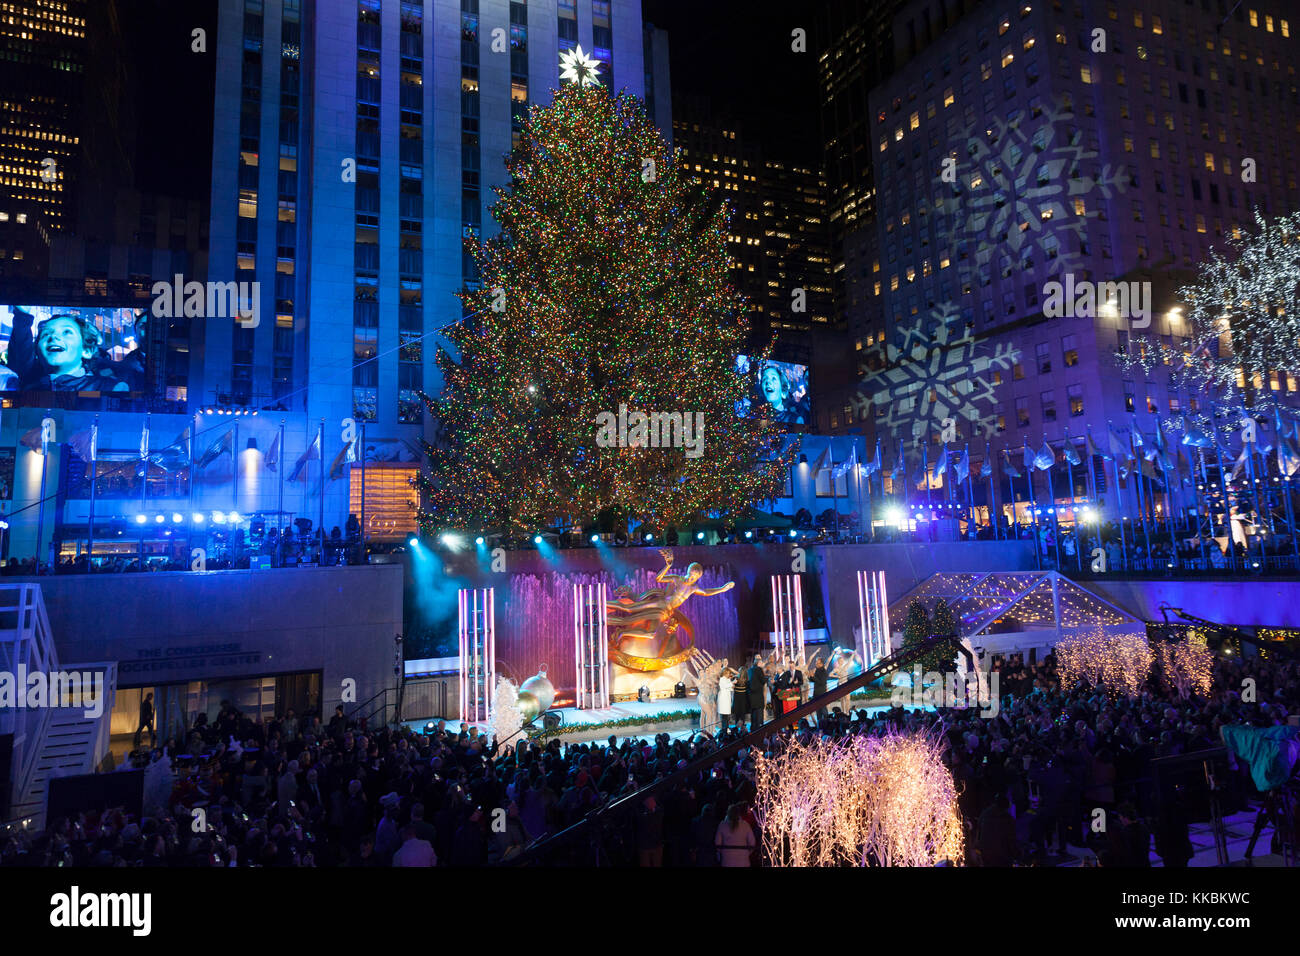 New York NY - November 29 2017 Atmosphere during the 85th Rockefeller Center Christmas Tree Lighting at Rockefeller Center hosted by NBC & New York NY - November 29 2017: Atmosphere during the 85th Stock ...